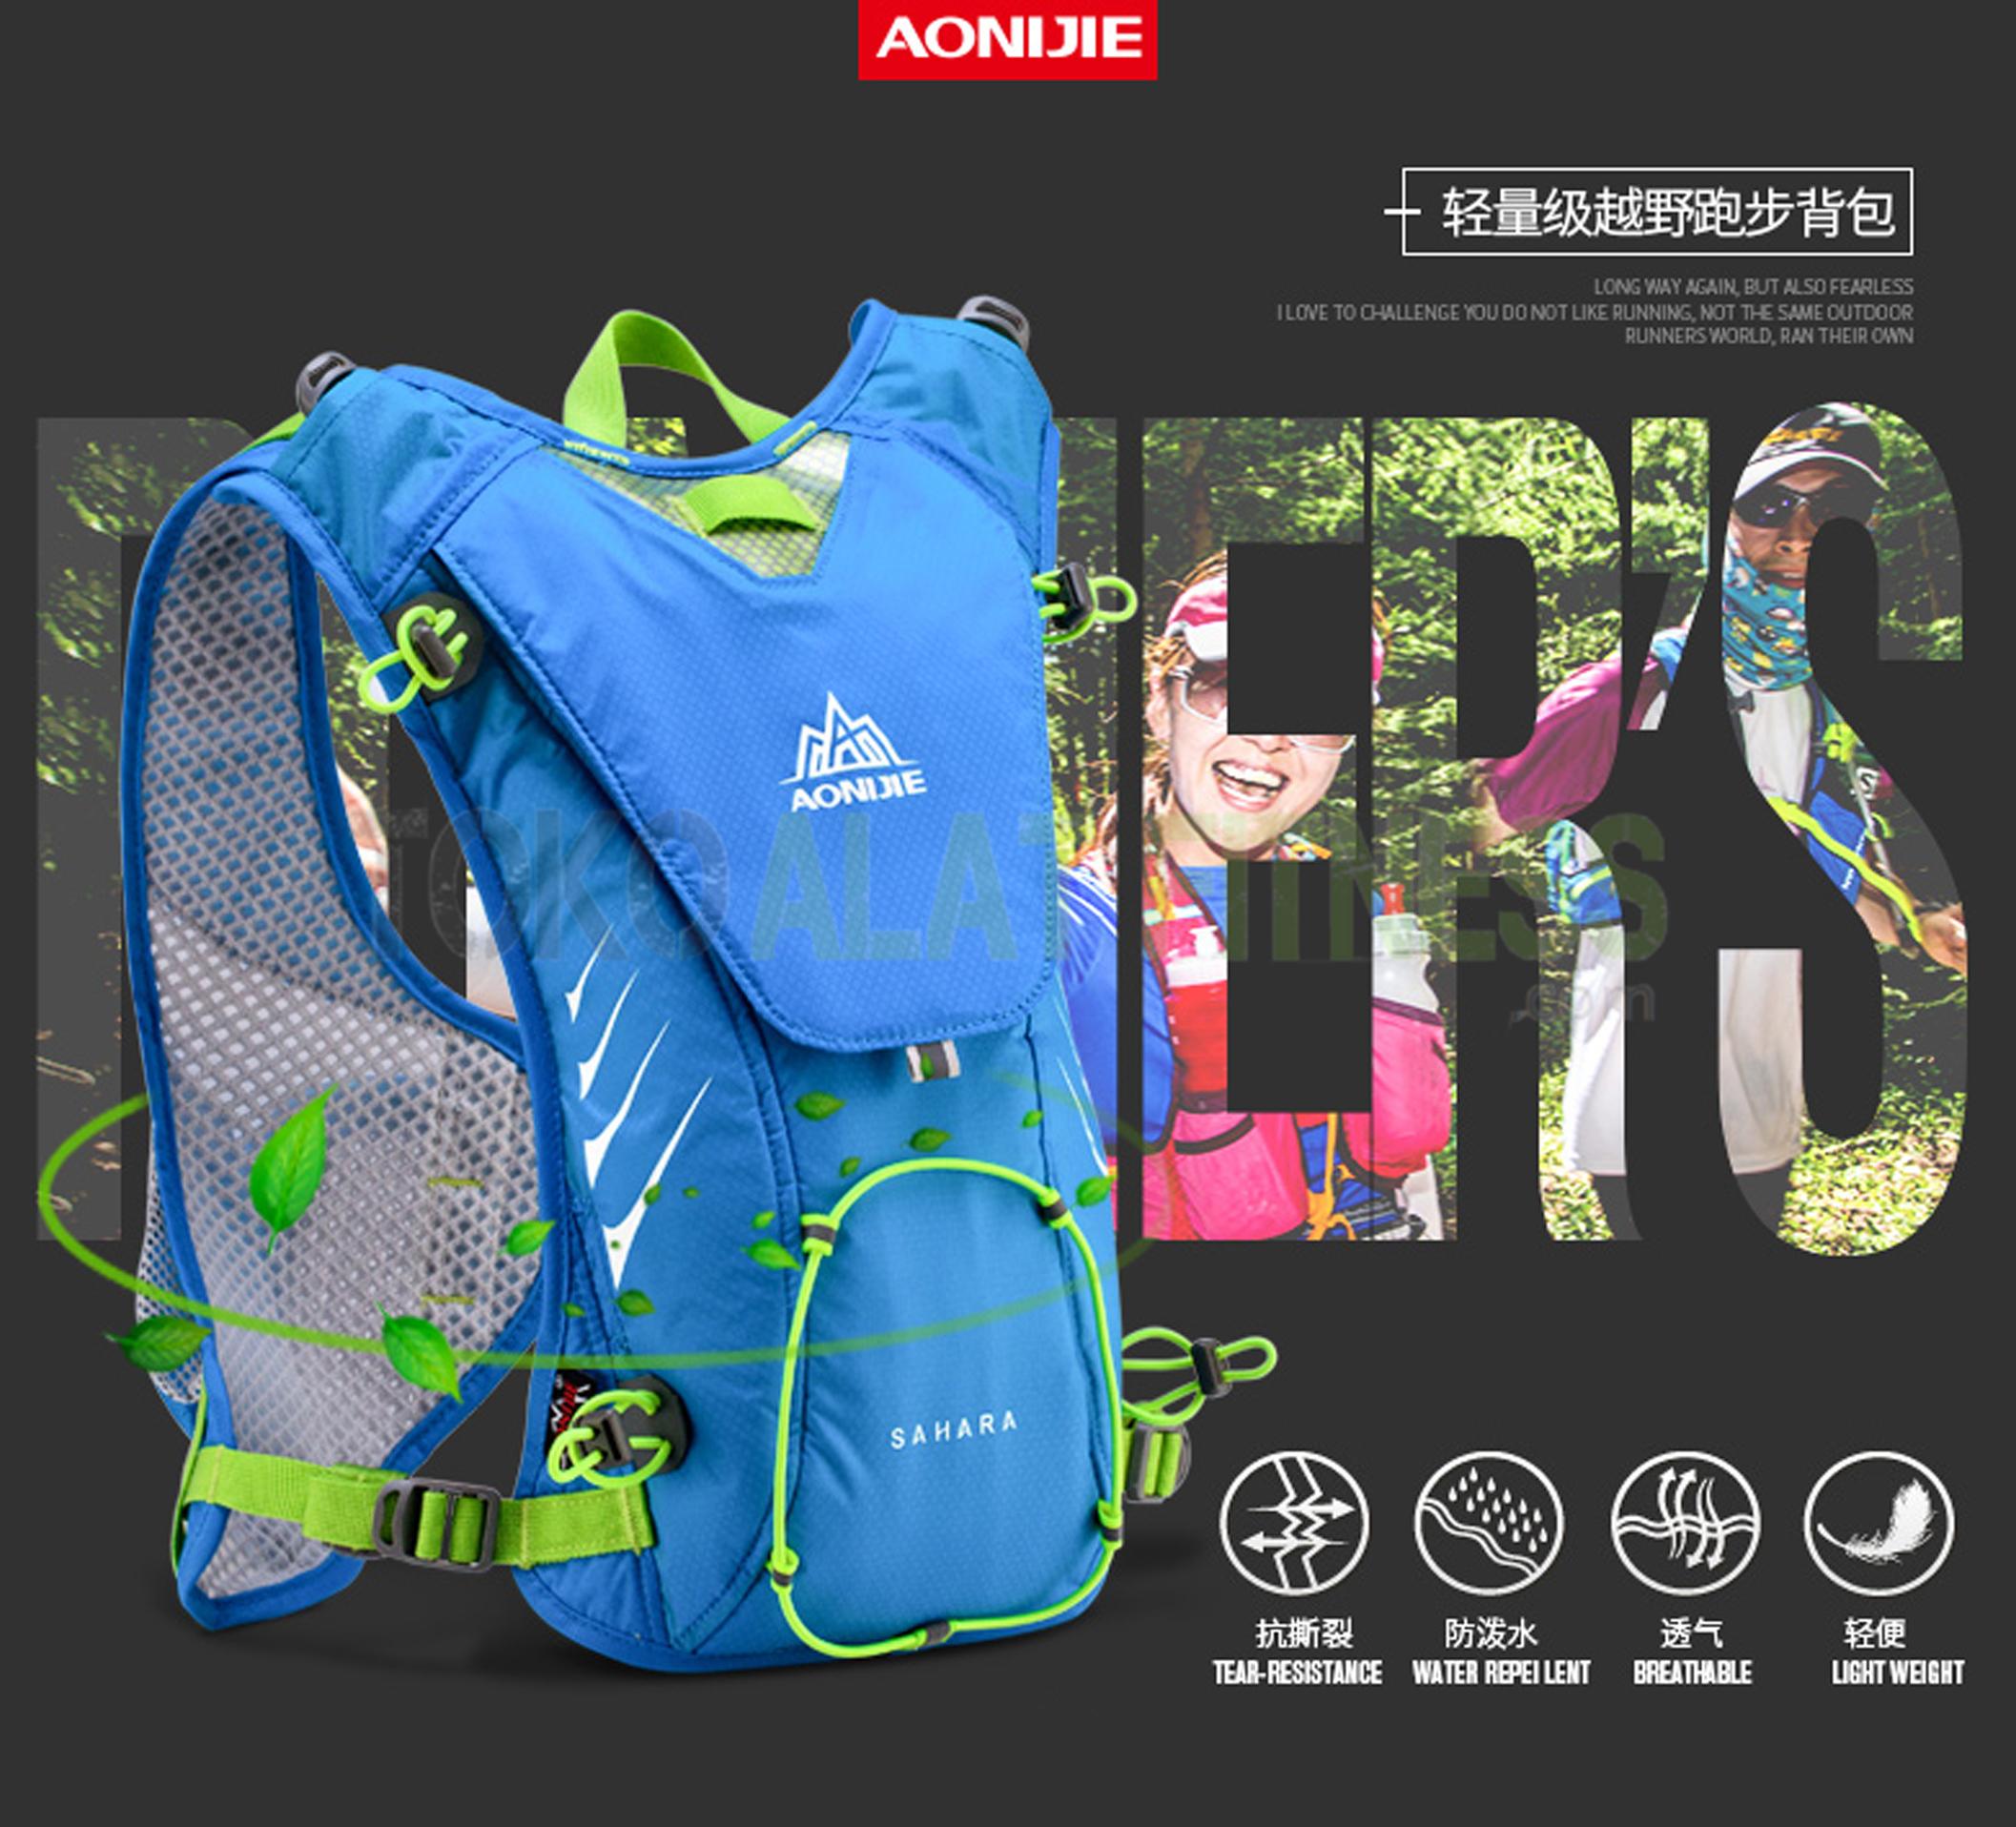 running bag 7 wtm - Aonijie Running Backpack Bag, Biru